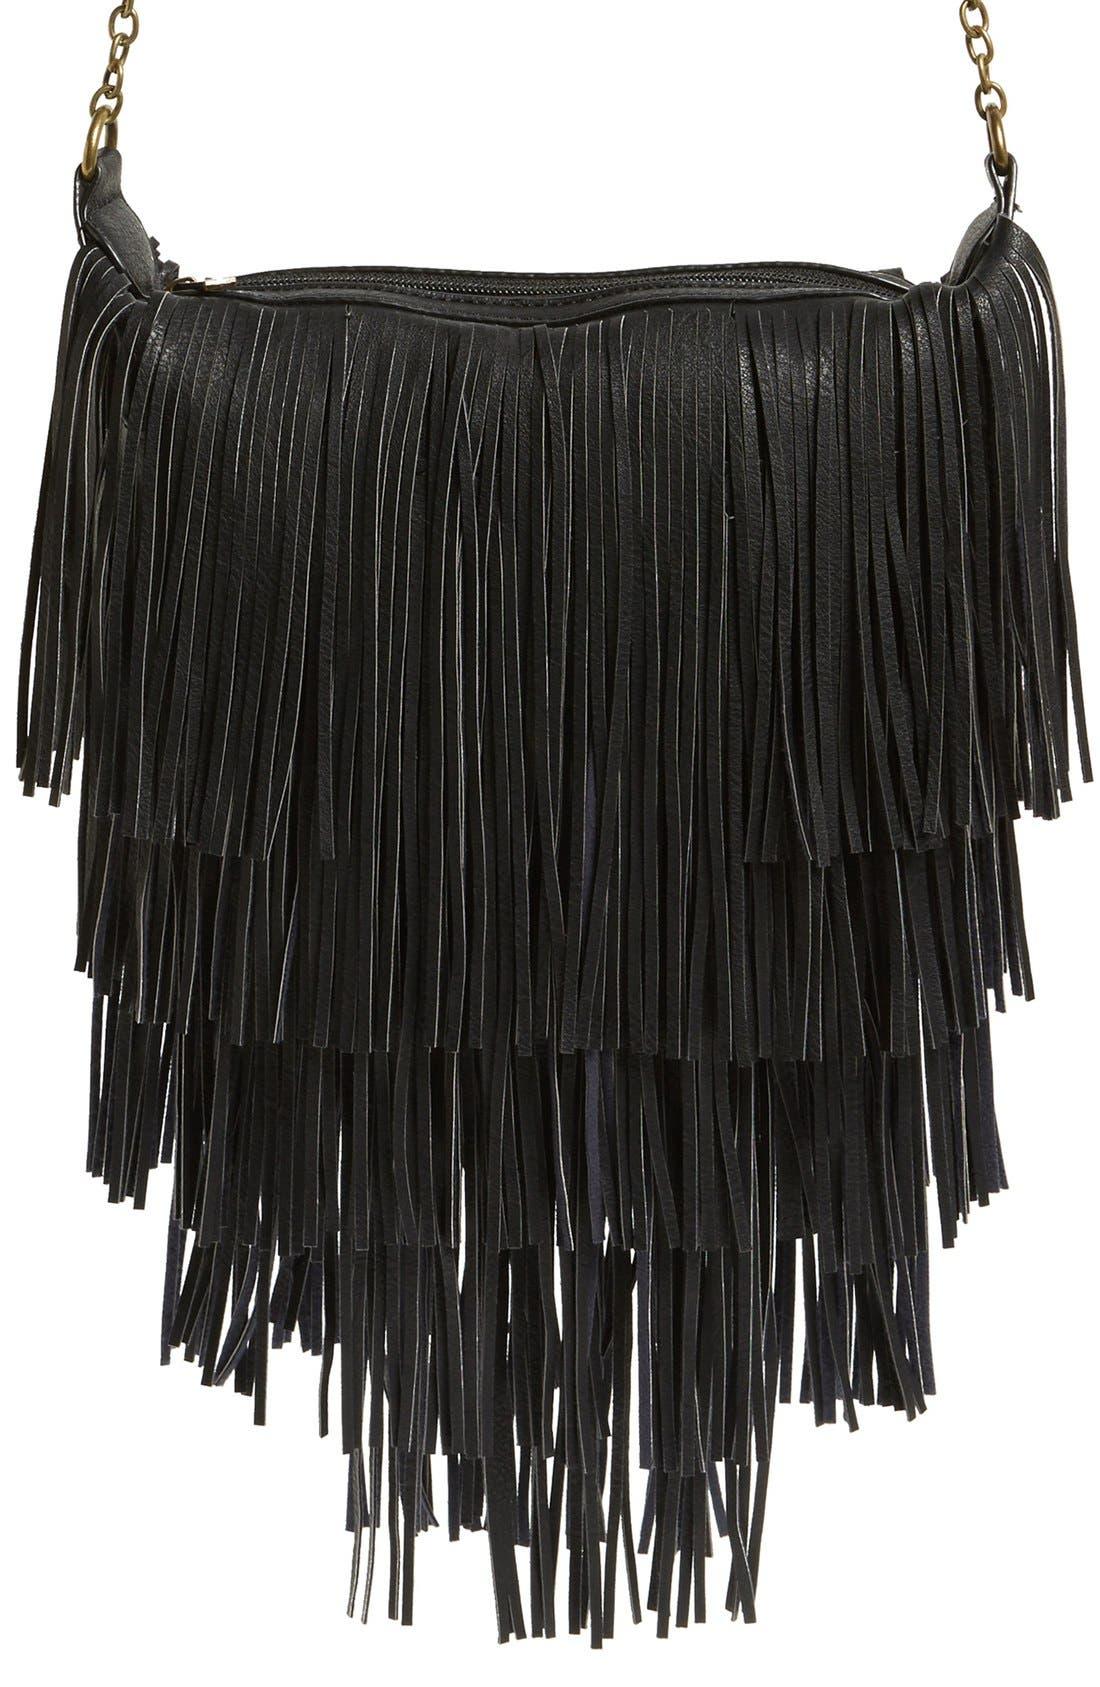 Alternate Image 1 Selected - NU-G 'Boho Fringe' Crossbody Bag